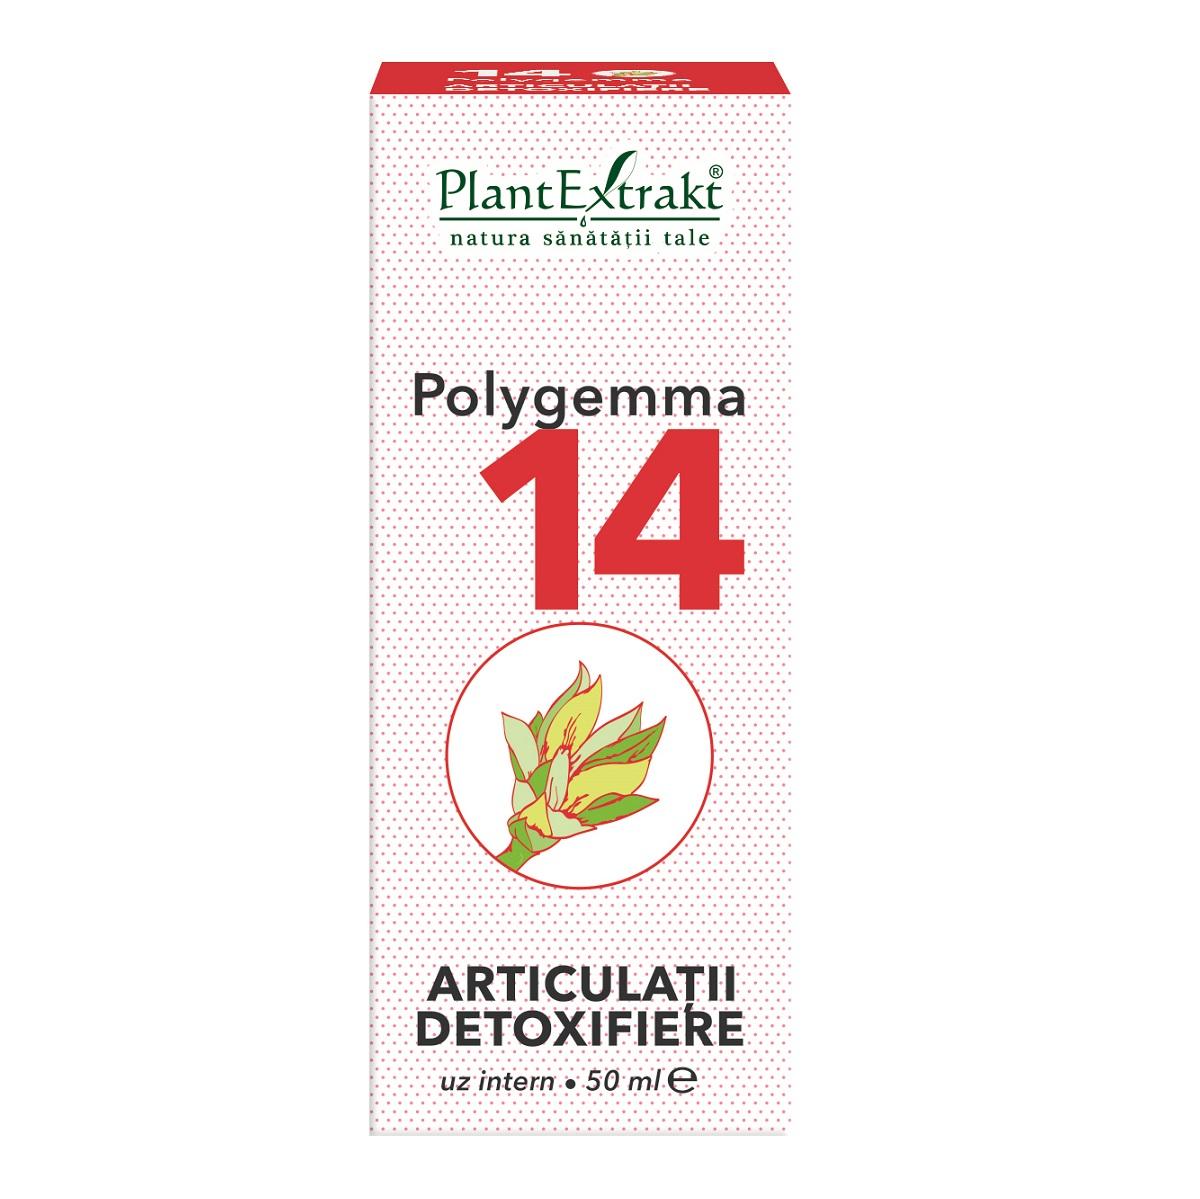 Polygemma 14 Articulatii detoxifiere, 50ml, Plant Extrakt drmax poza